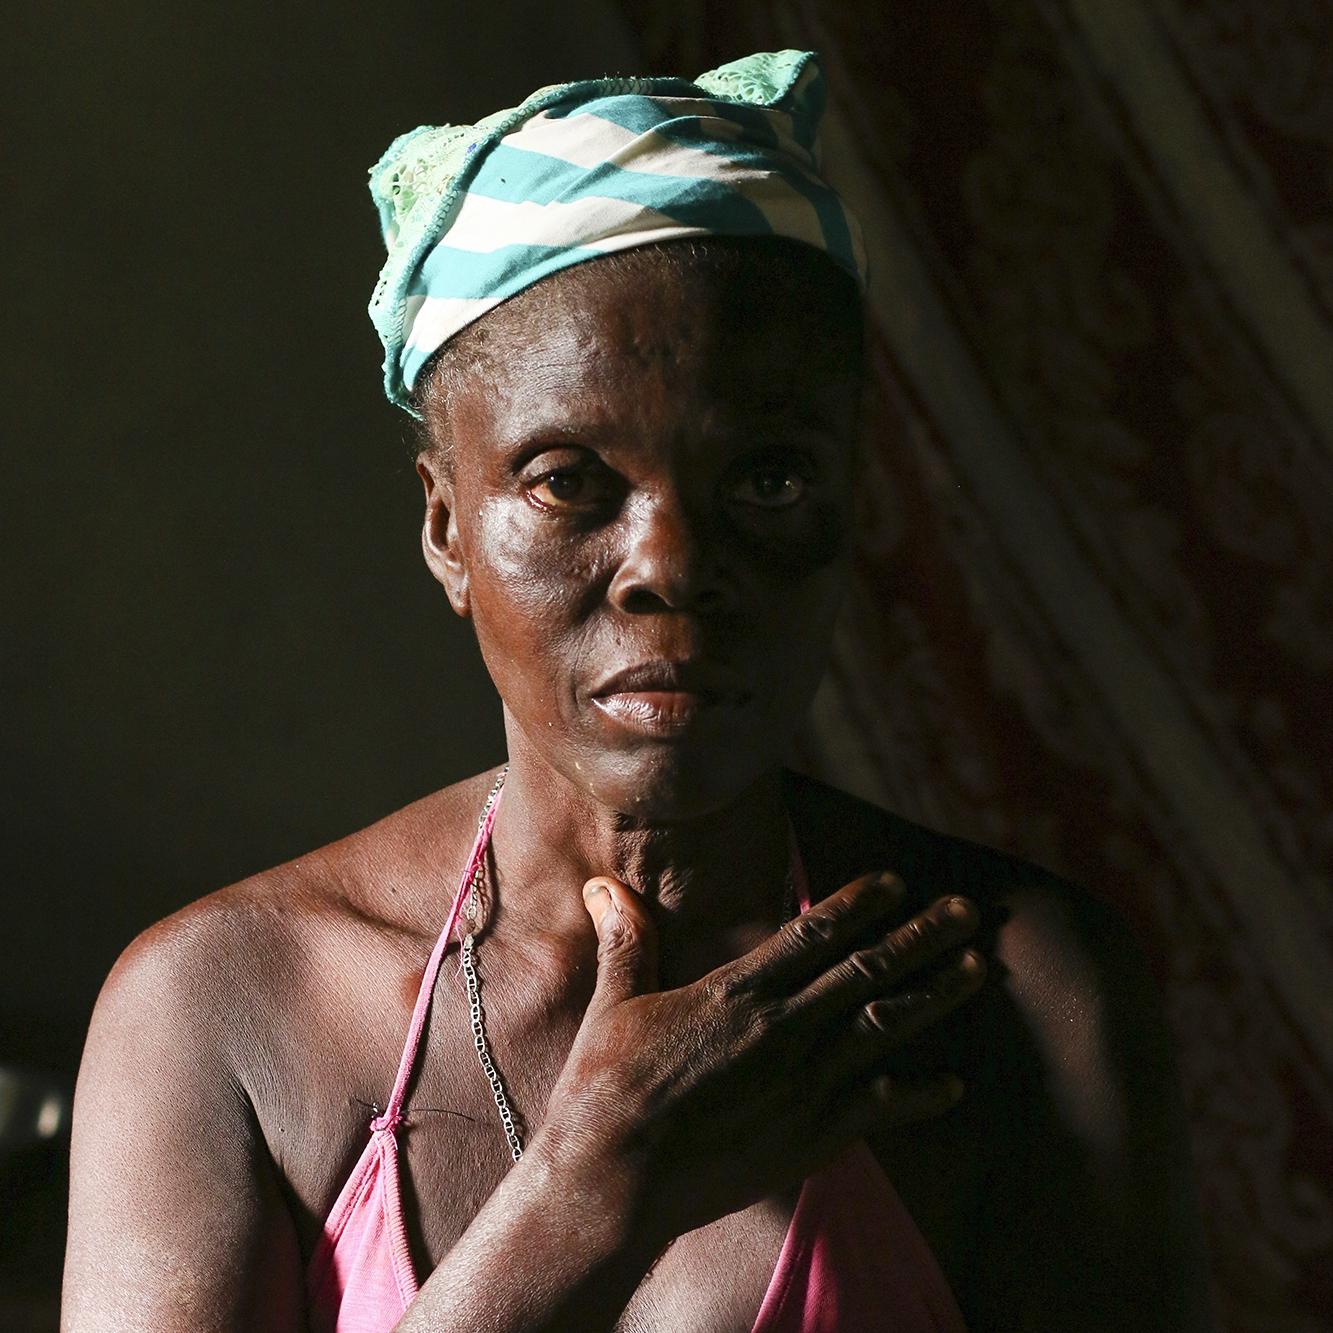 Koleman Franswa. La Chapelle, Haiti. Photo/Annalee Giesbrecht